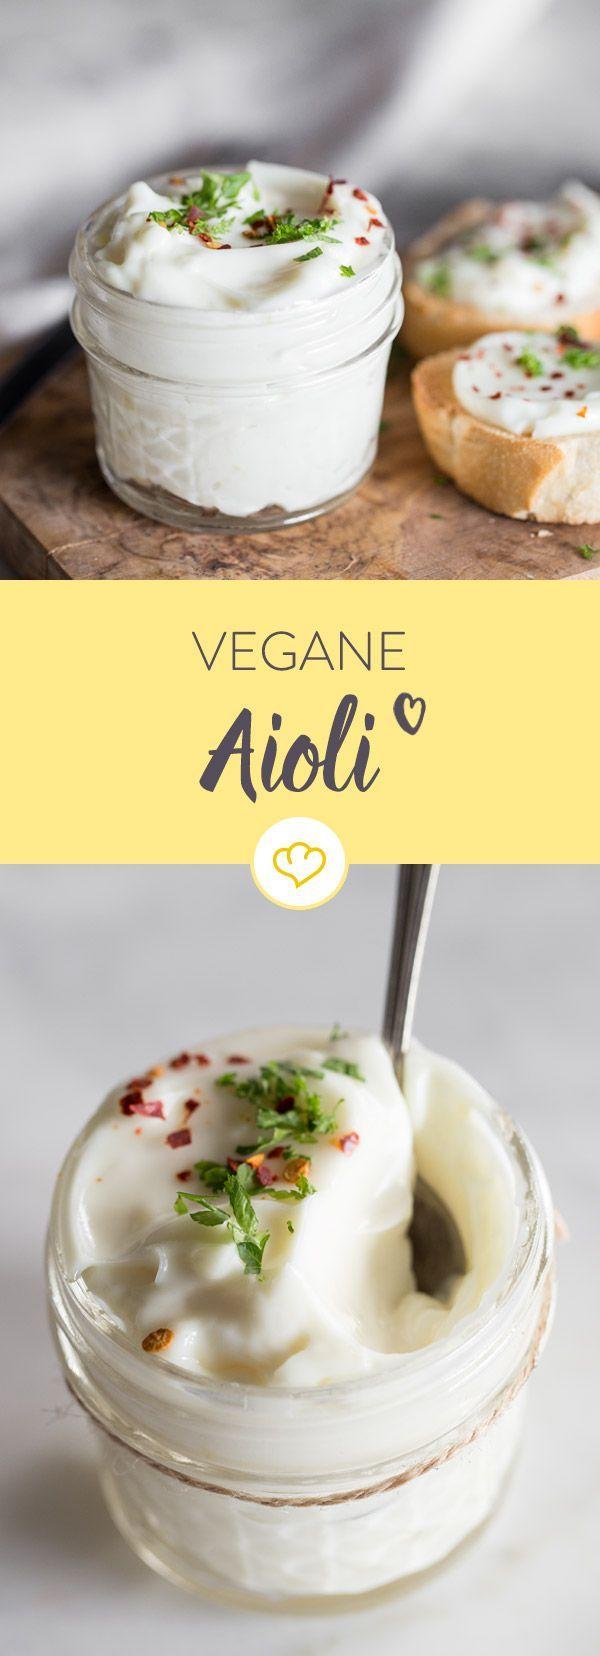 Vegane Aioli mit geröstetem Brot   - Es wird angegrillt! | Barbecue - #Aioli #angegrillt #Barbecue #...